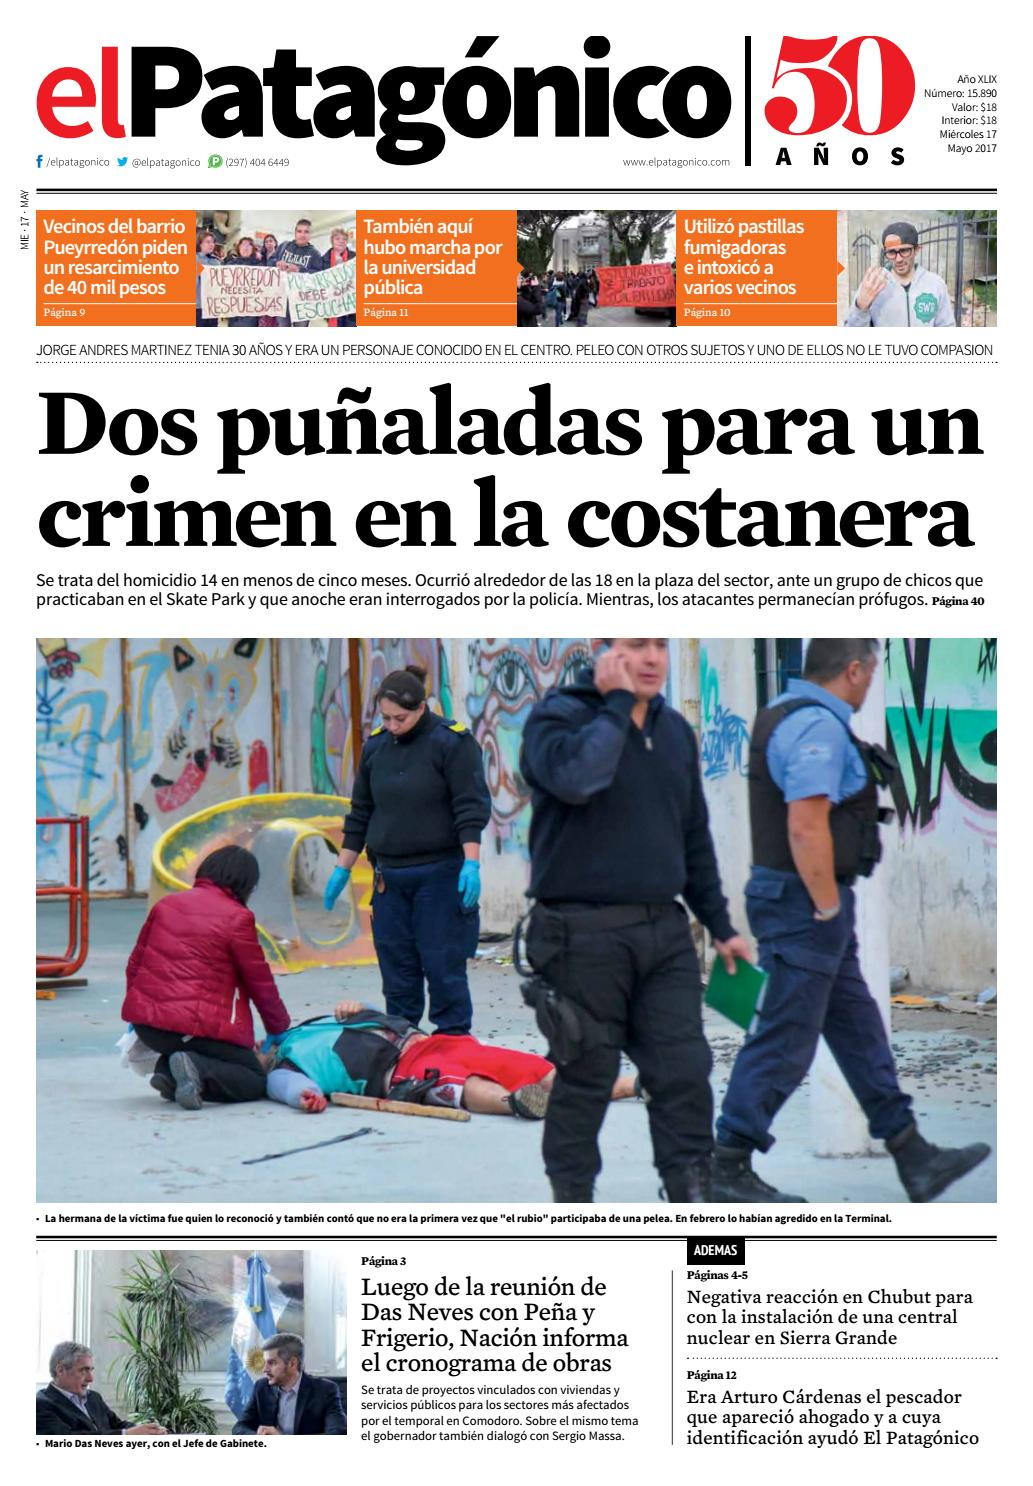 edicion223116052017.pdf by El Patagonico - issuu